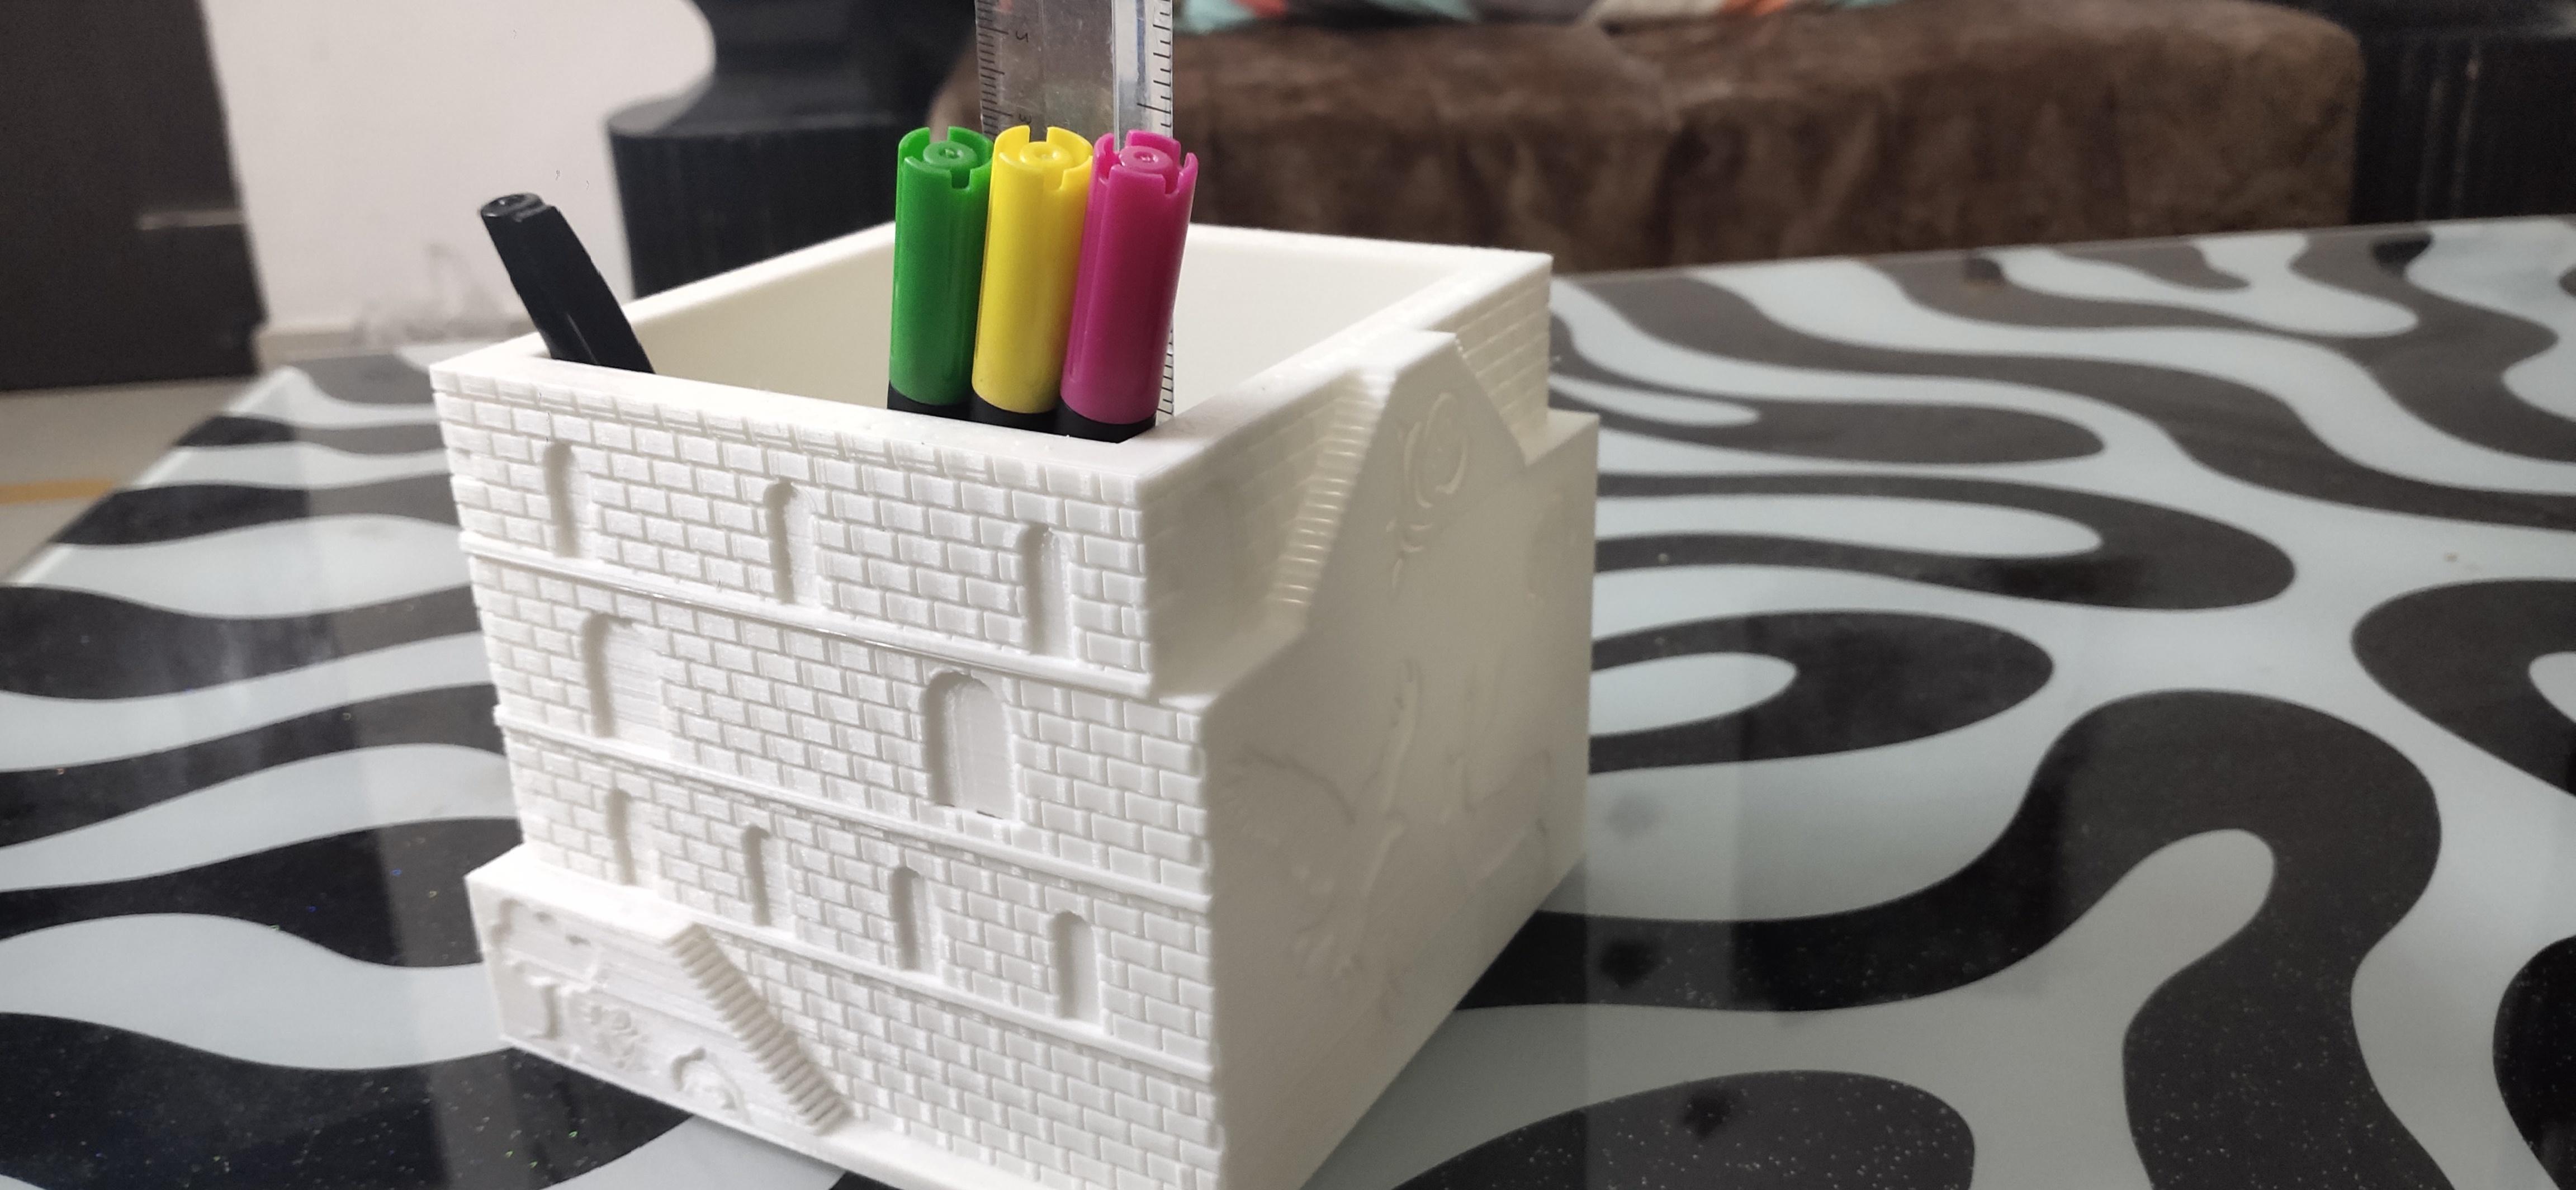 IMG_20200928_160333.jpg Download STL file Plant and desk pot • 3D printer object, FutureDesigns